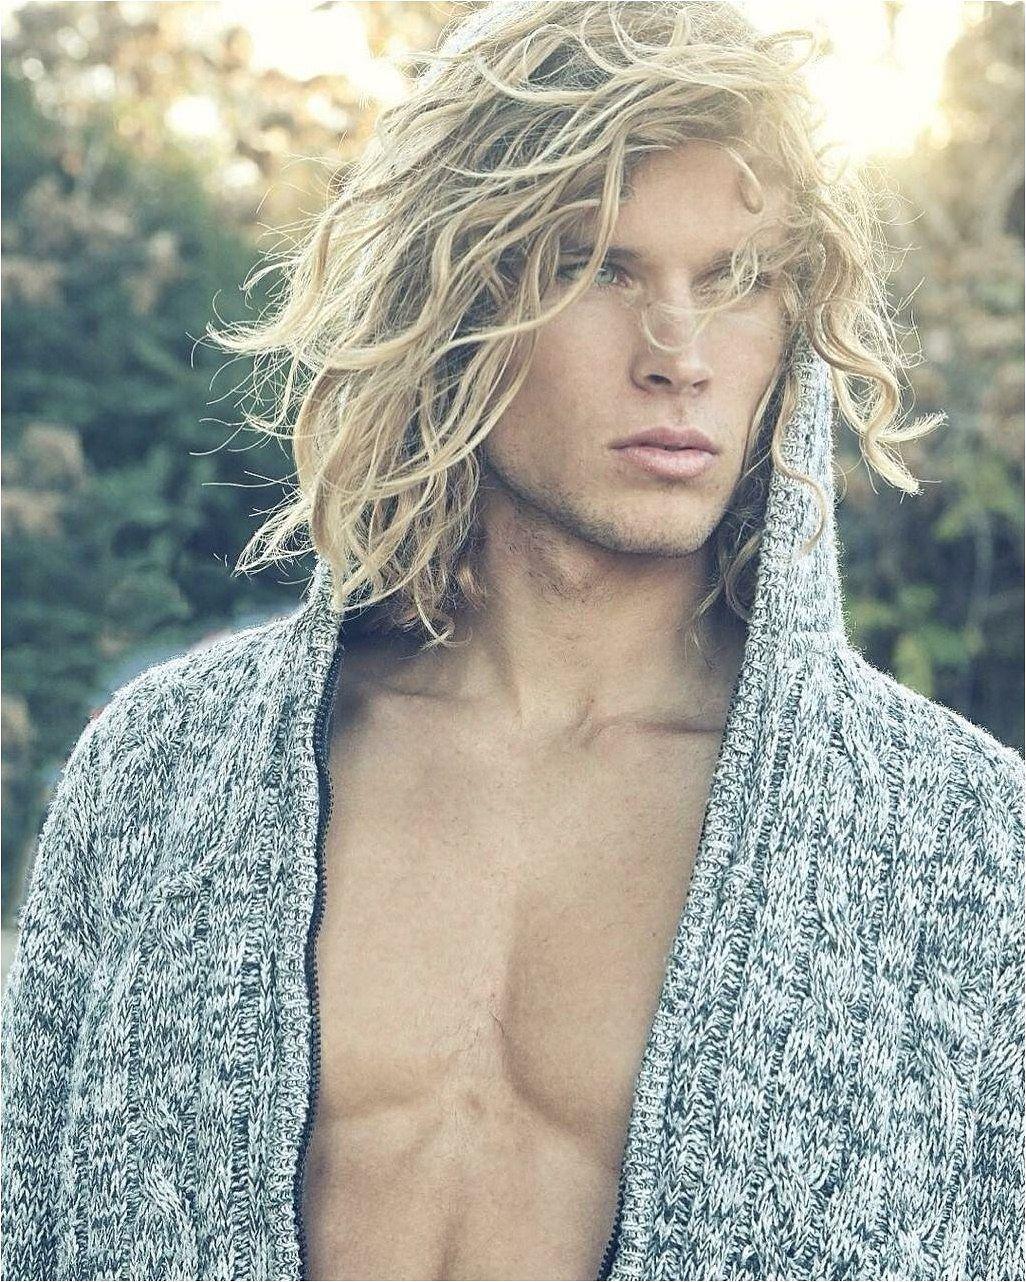 Frisuren Mnner 2019 Kurz Click On The Image Or Link For More Details Surfer Hair Long Hair Styles Men Boys Long Hairstyles